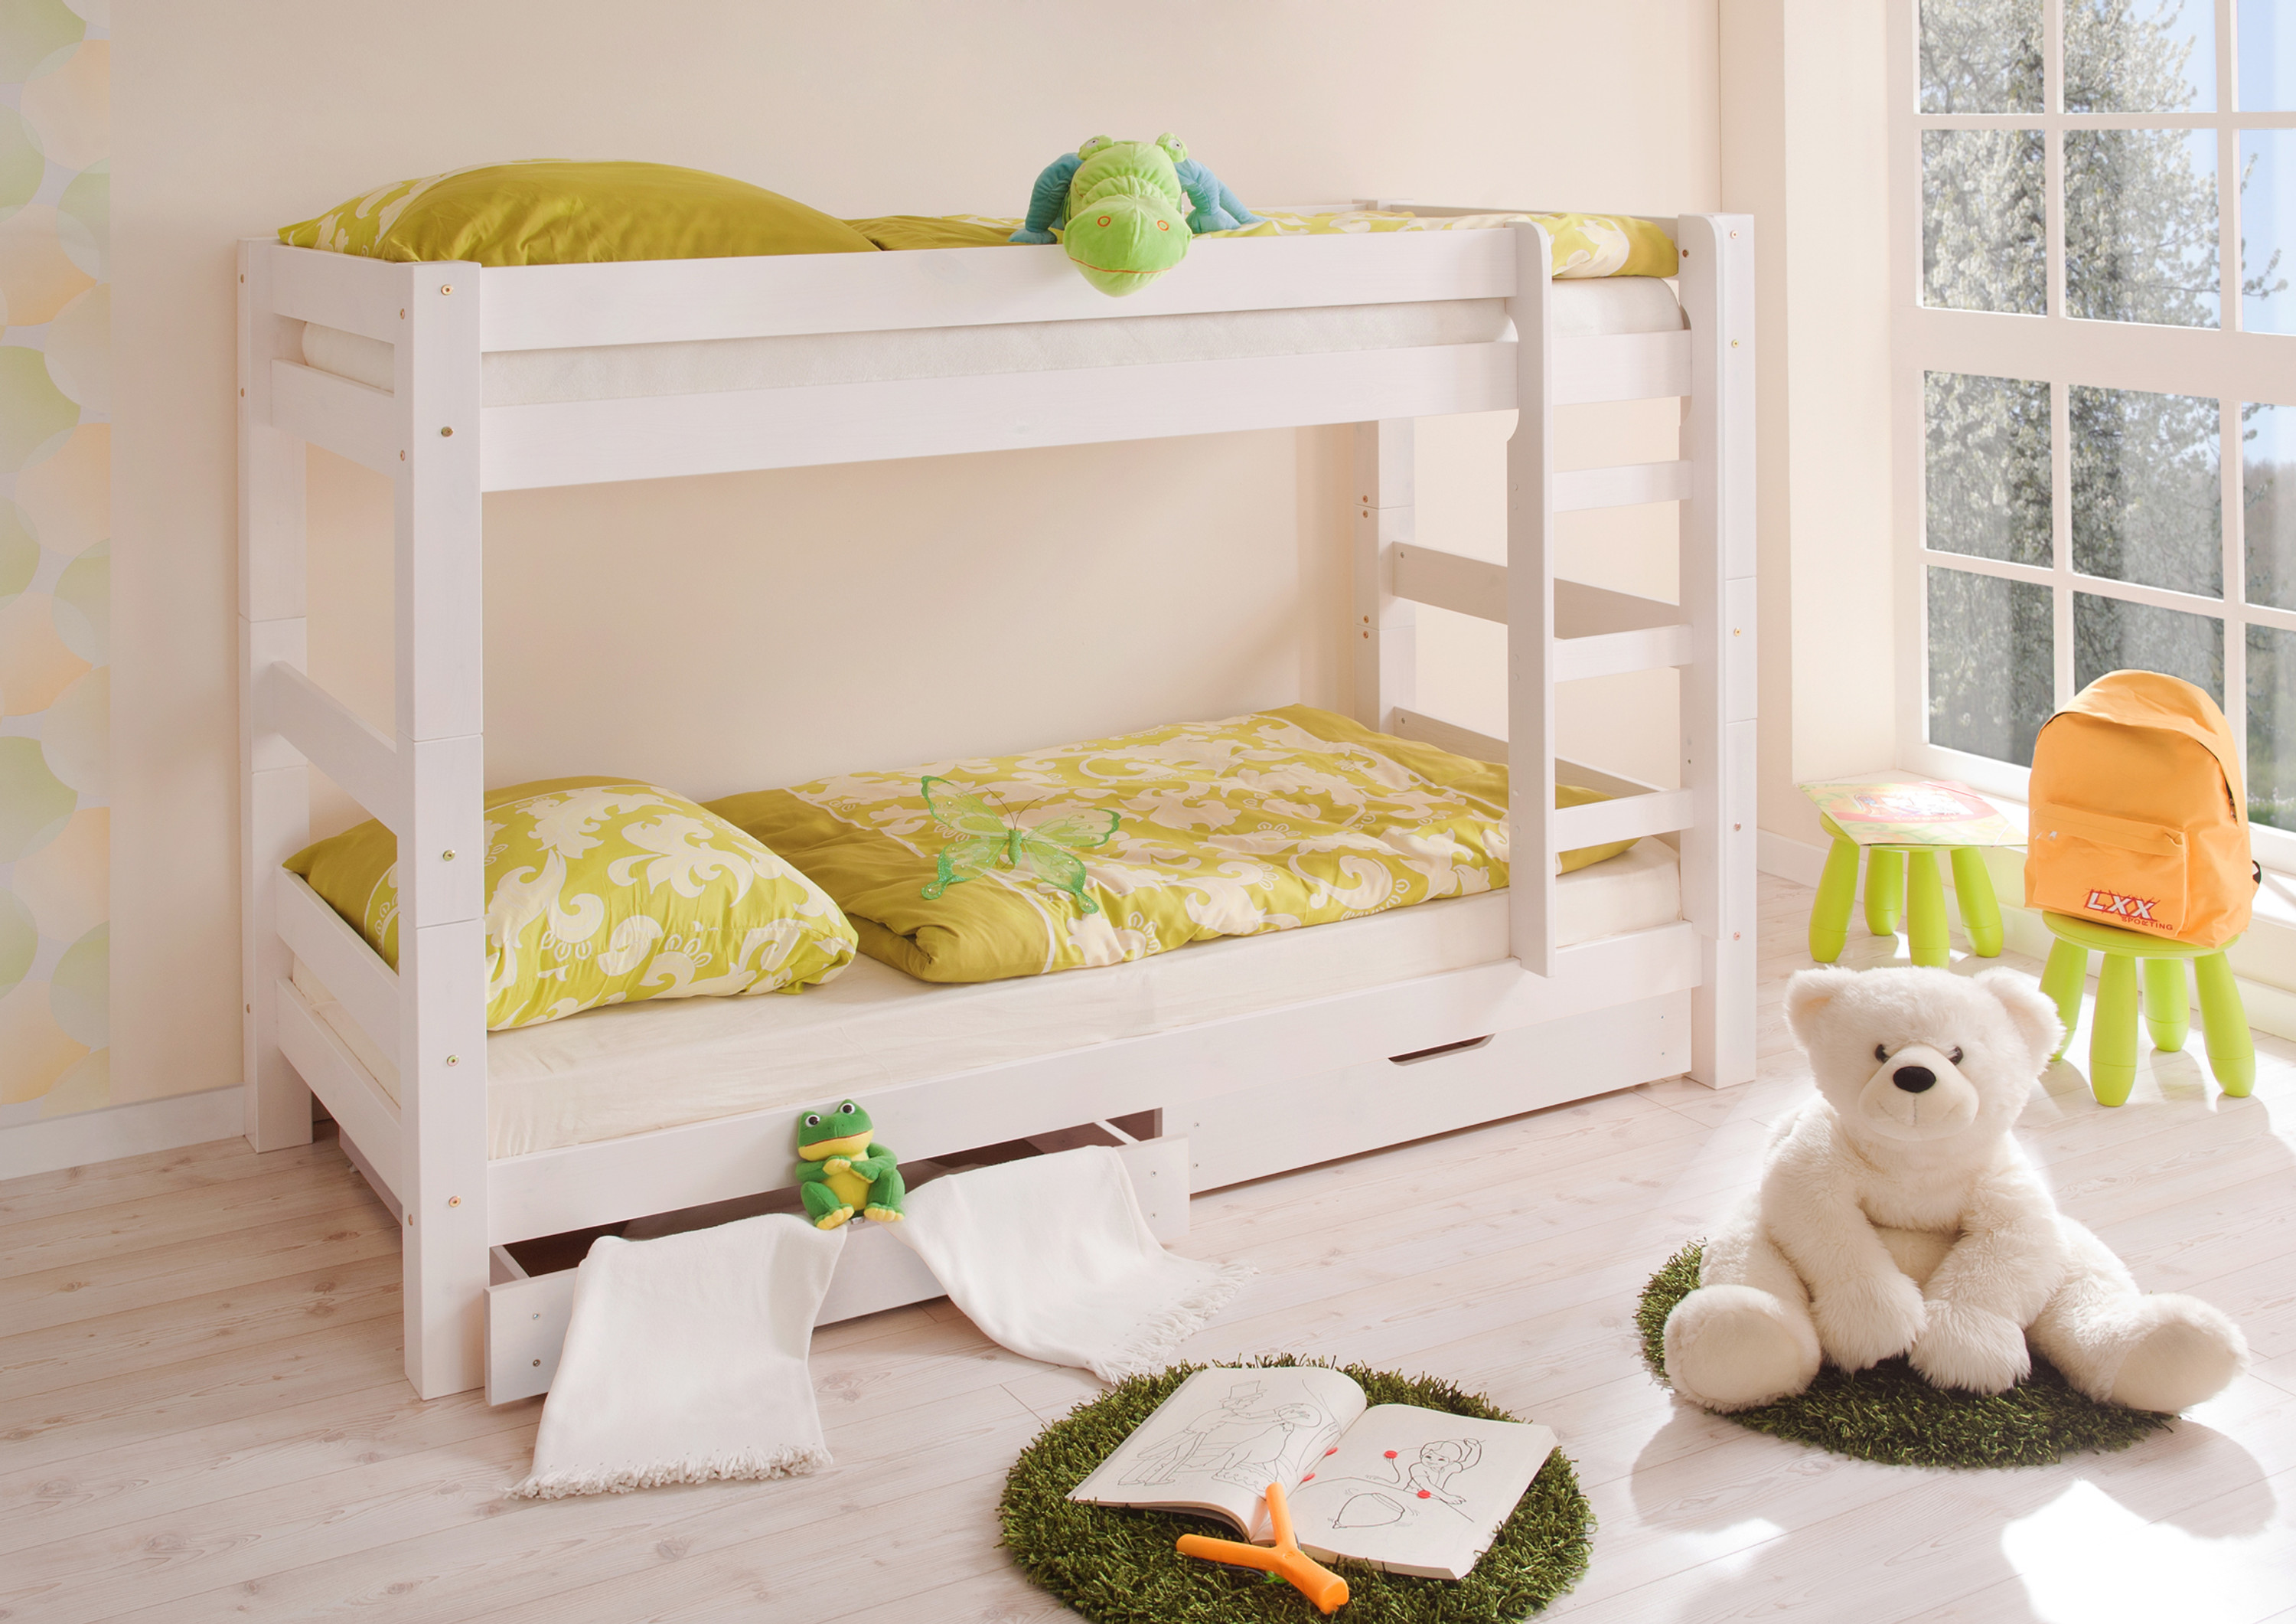 Etagenbett Kind Und Baby : Etagenbett doppelbett stockbett jan kiefer massiv weiss teilbar kind